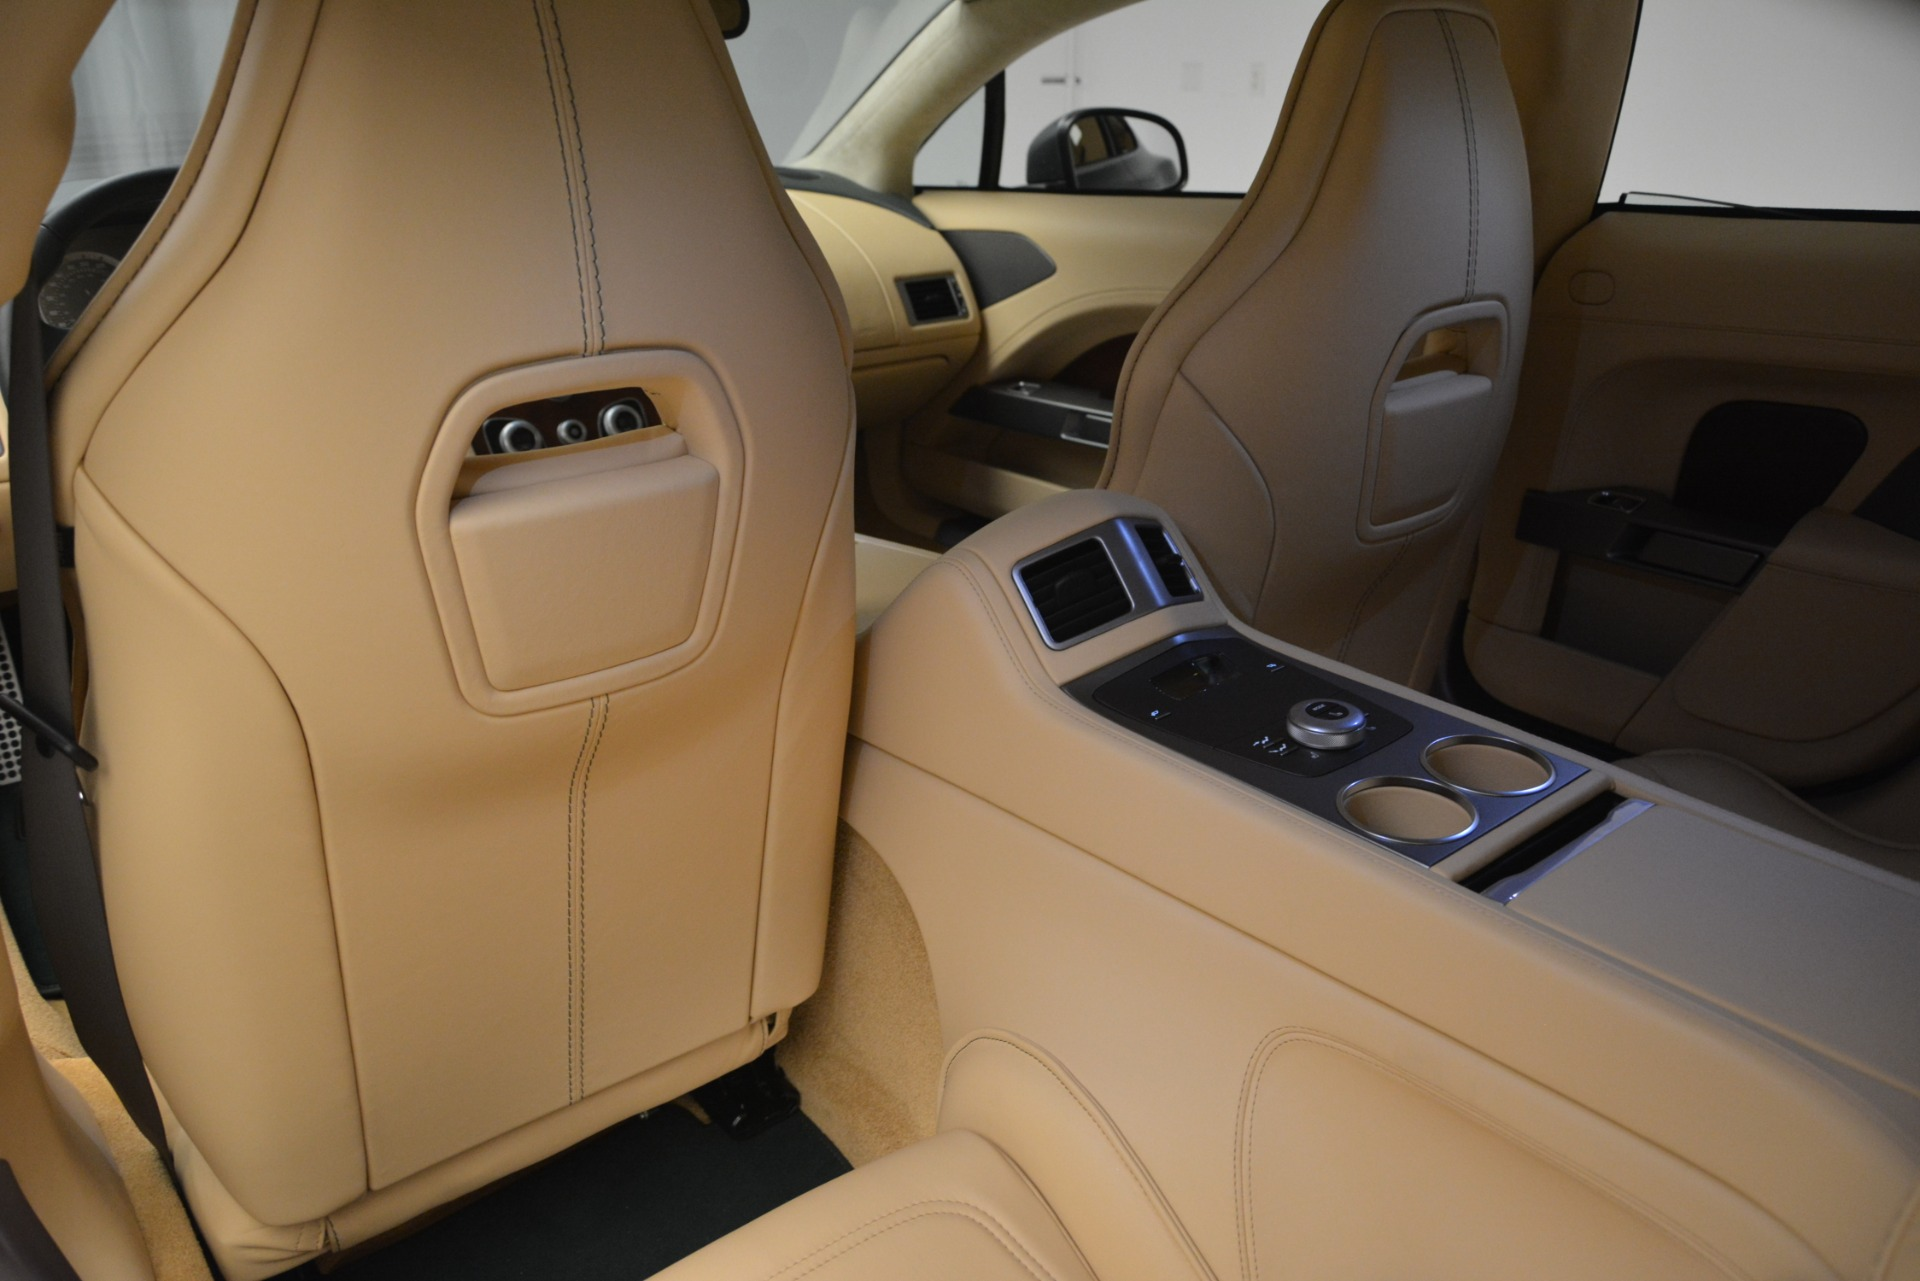 Used 2017 Aston Martin Rapide S Sedan For Sale In Greenwich, CT 2889_p18